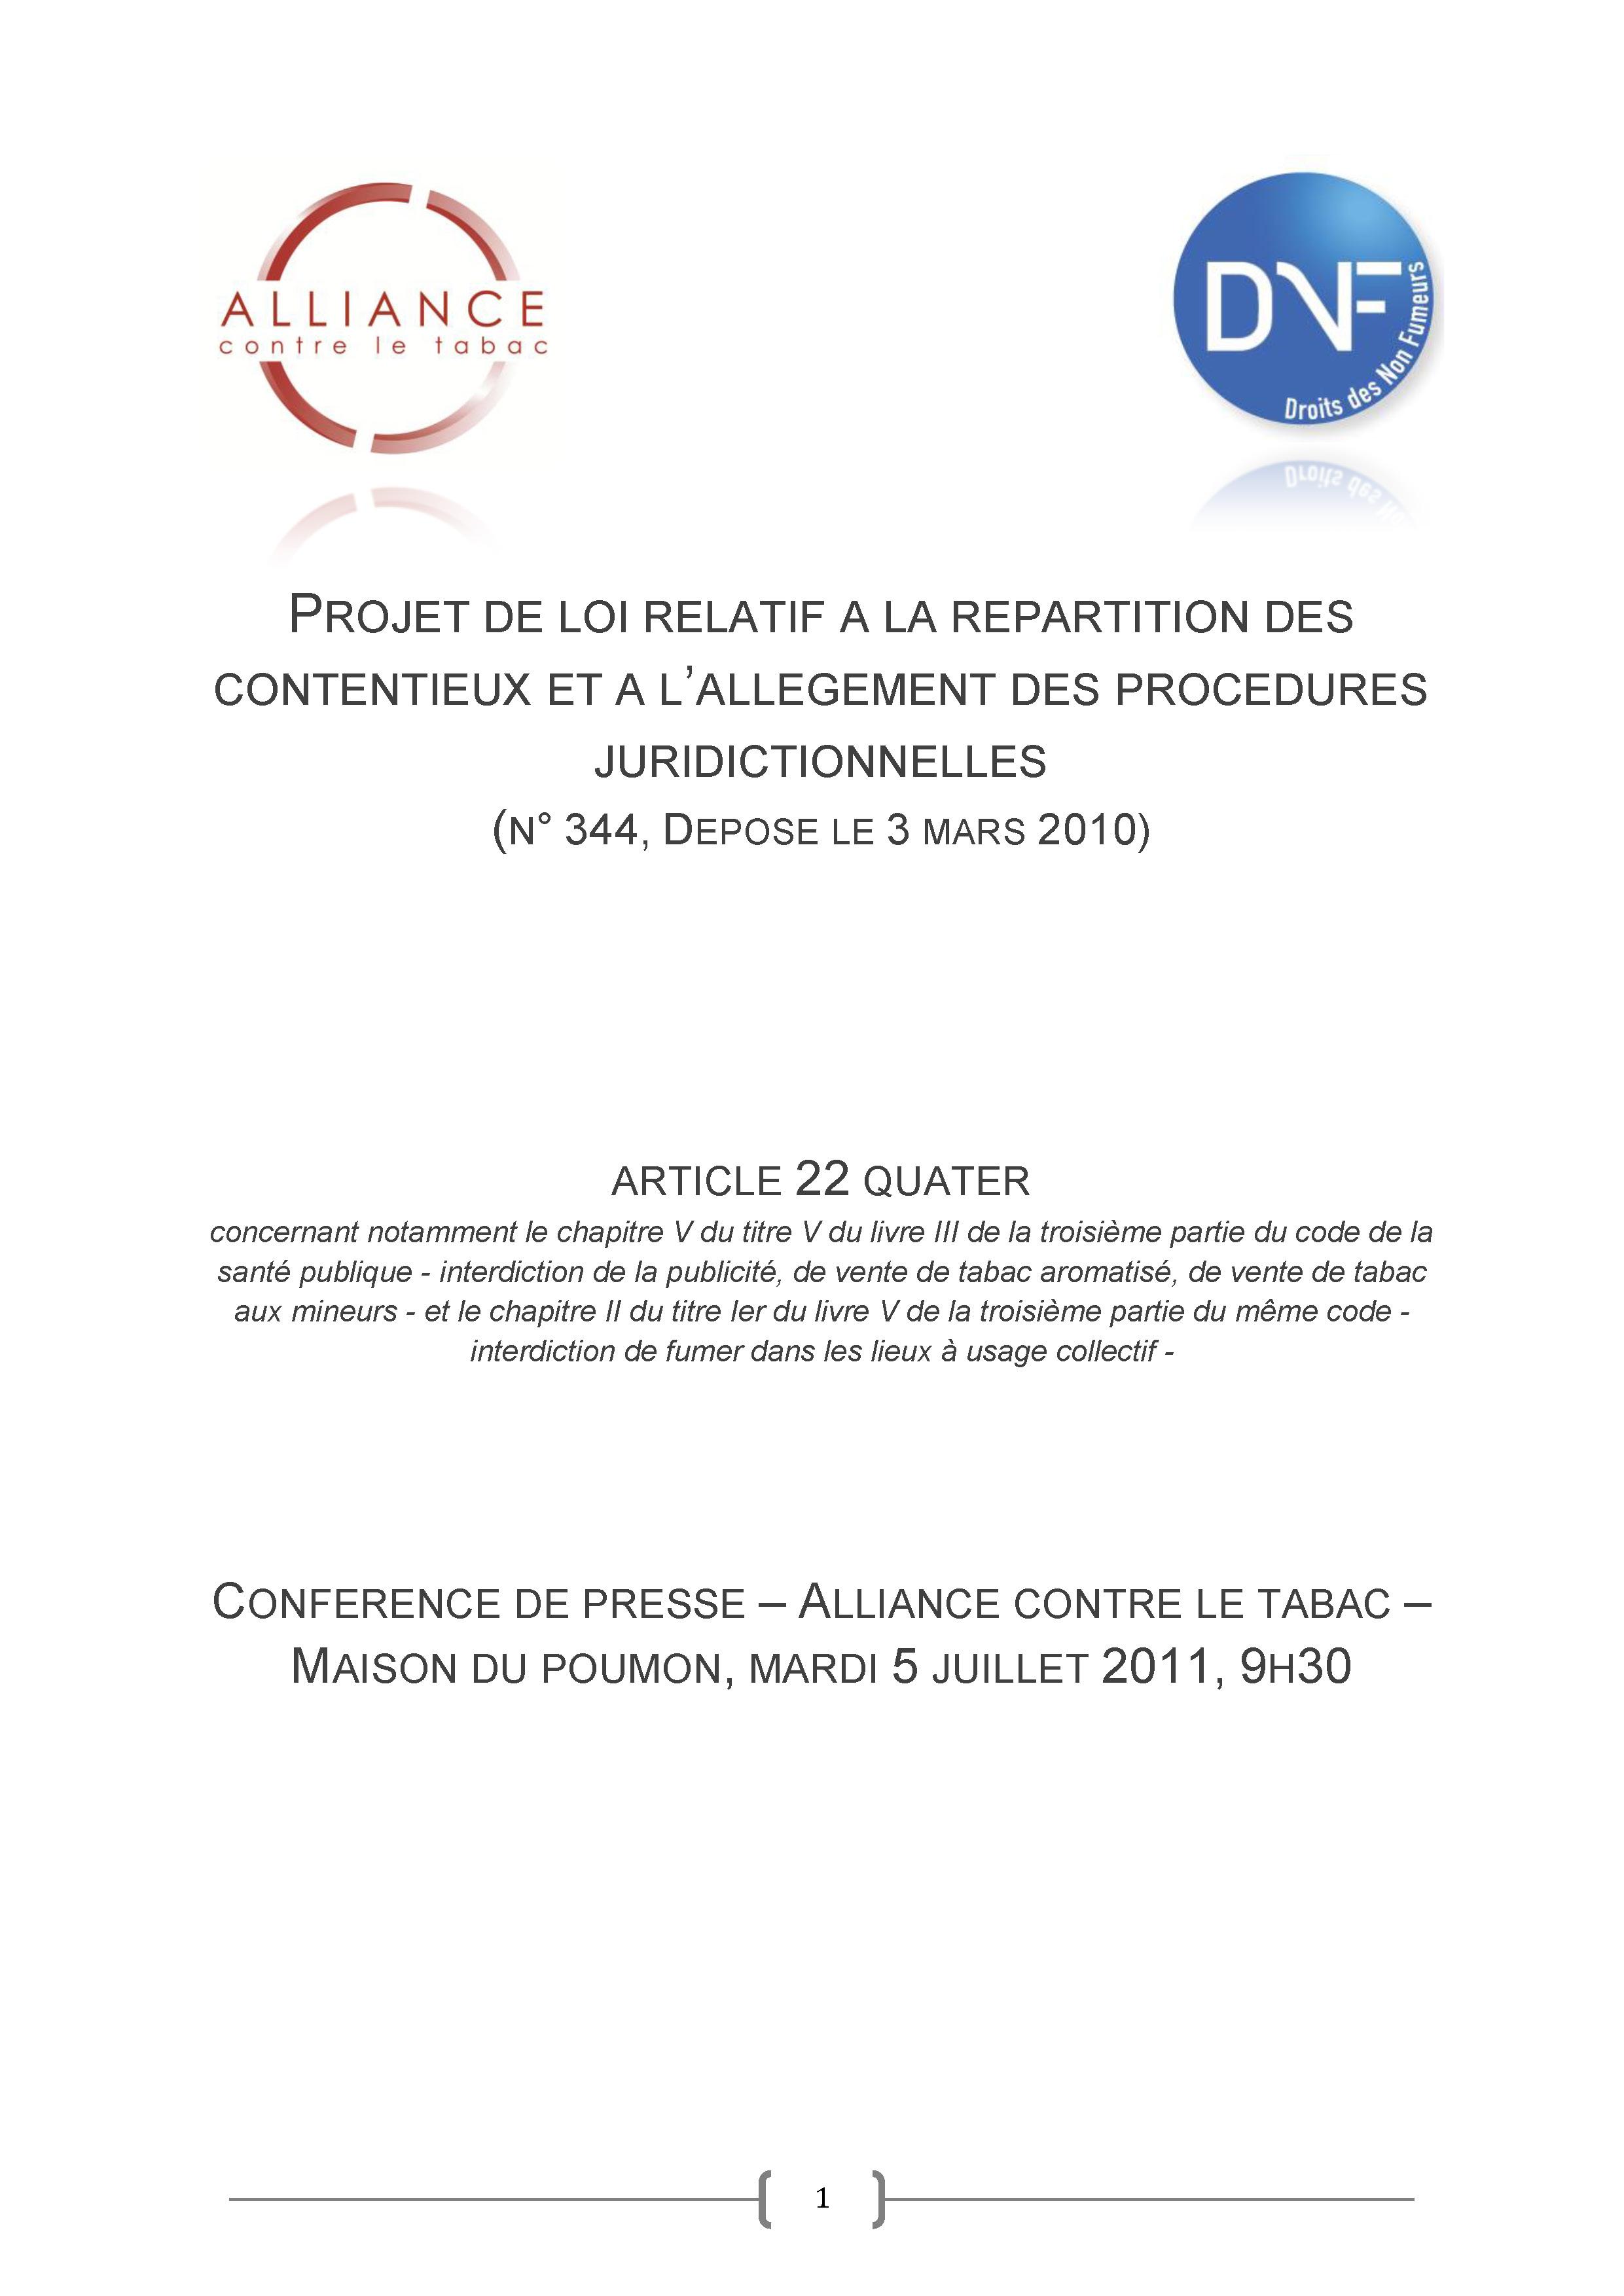 Alliance-DP_projet-loi-article-22-quater_05juil2011_Page_1.jpg